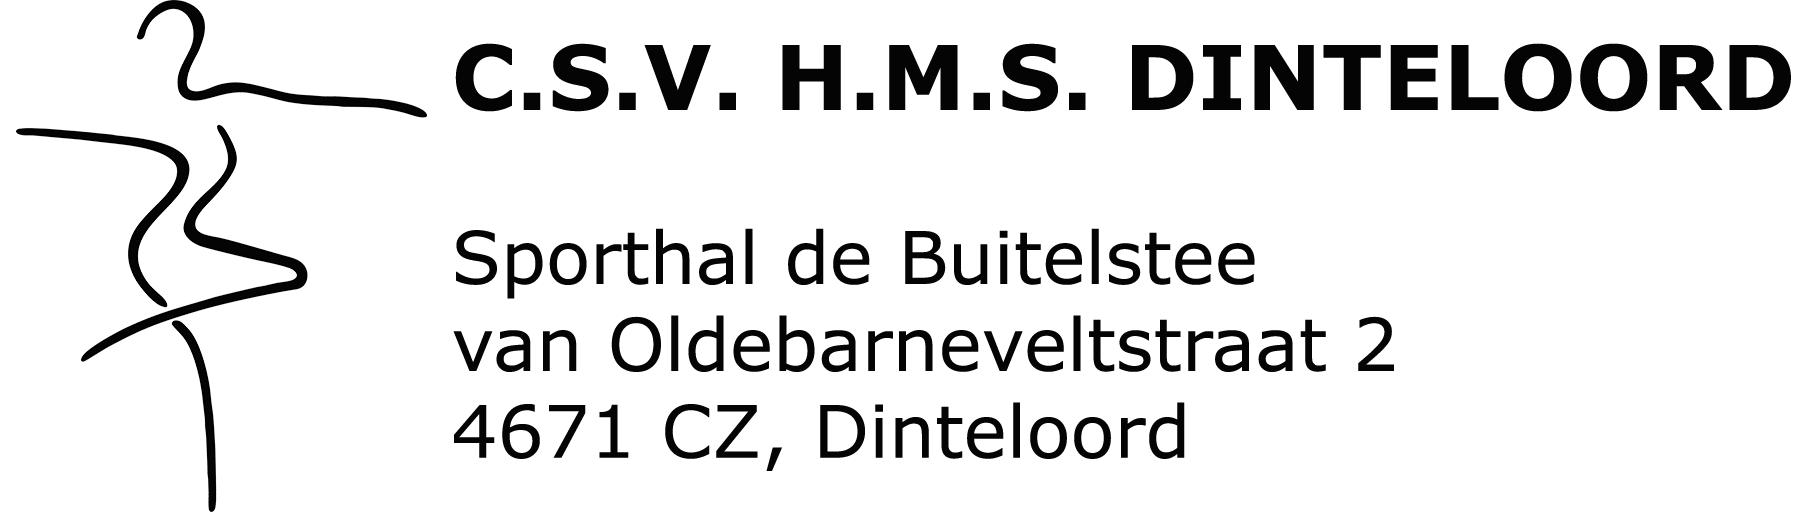 HMS-adres